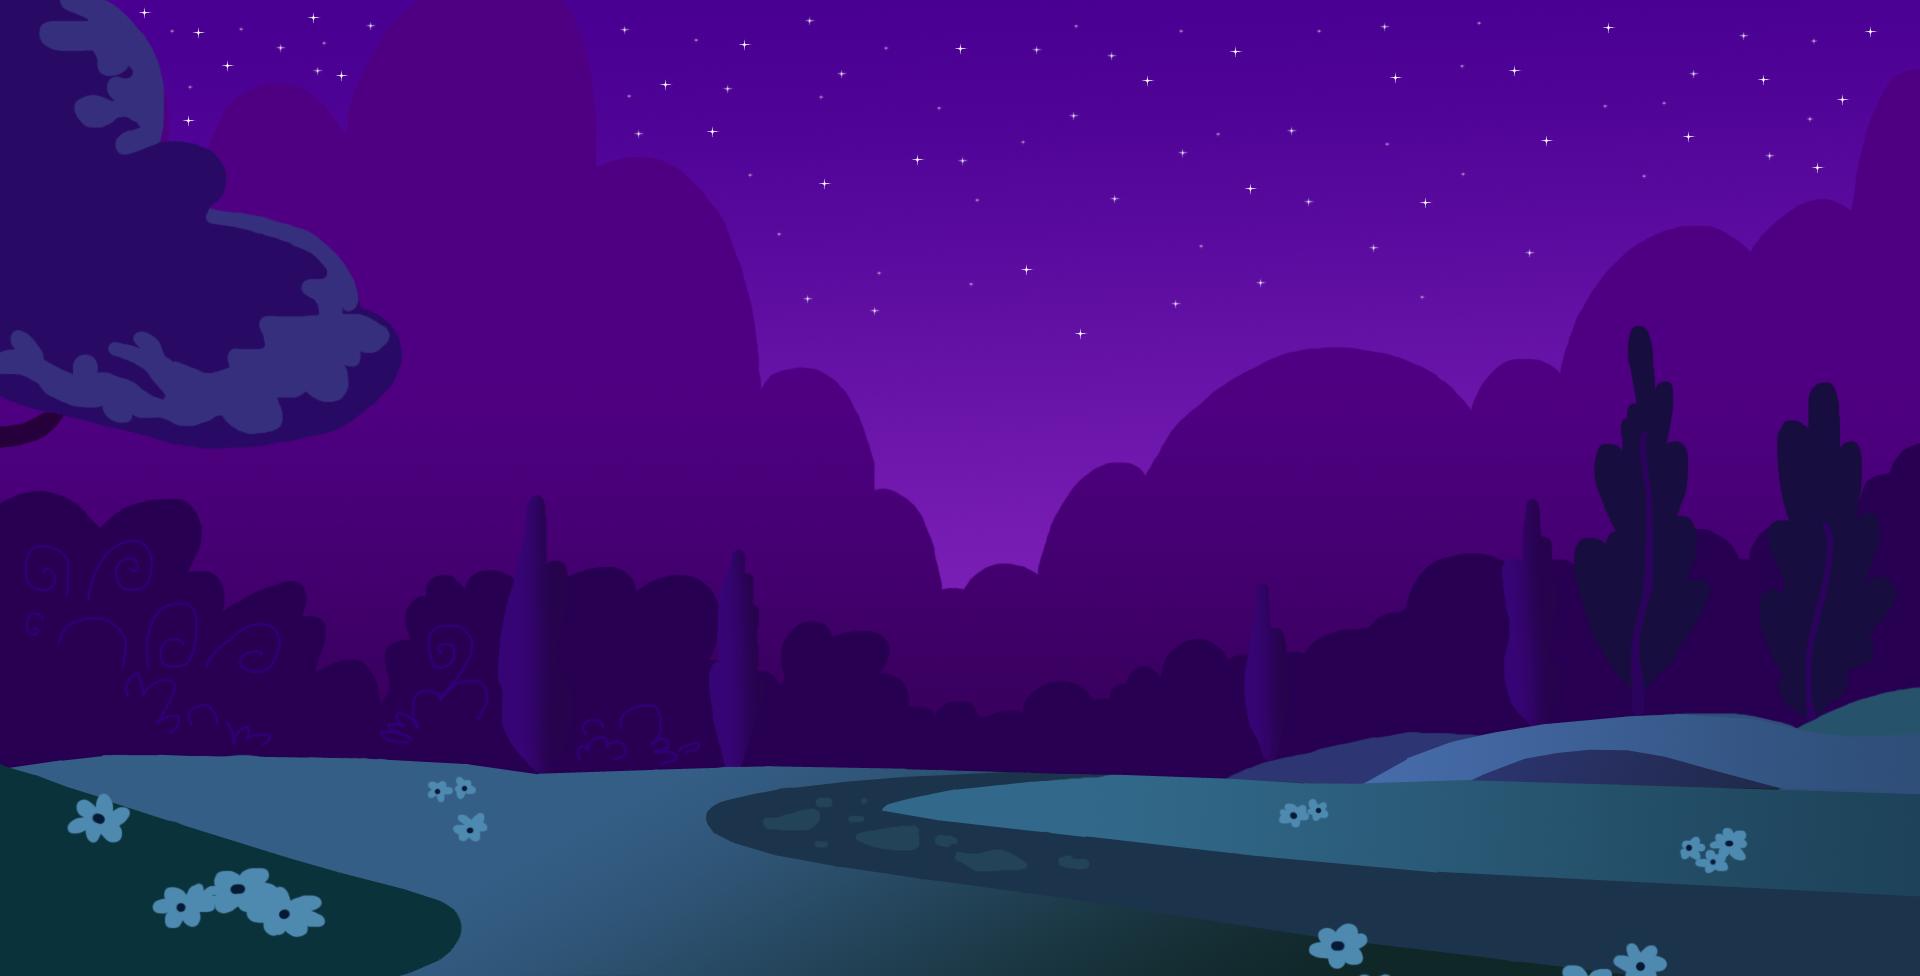 MLPFiM Night background by TeaganLouise